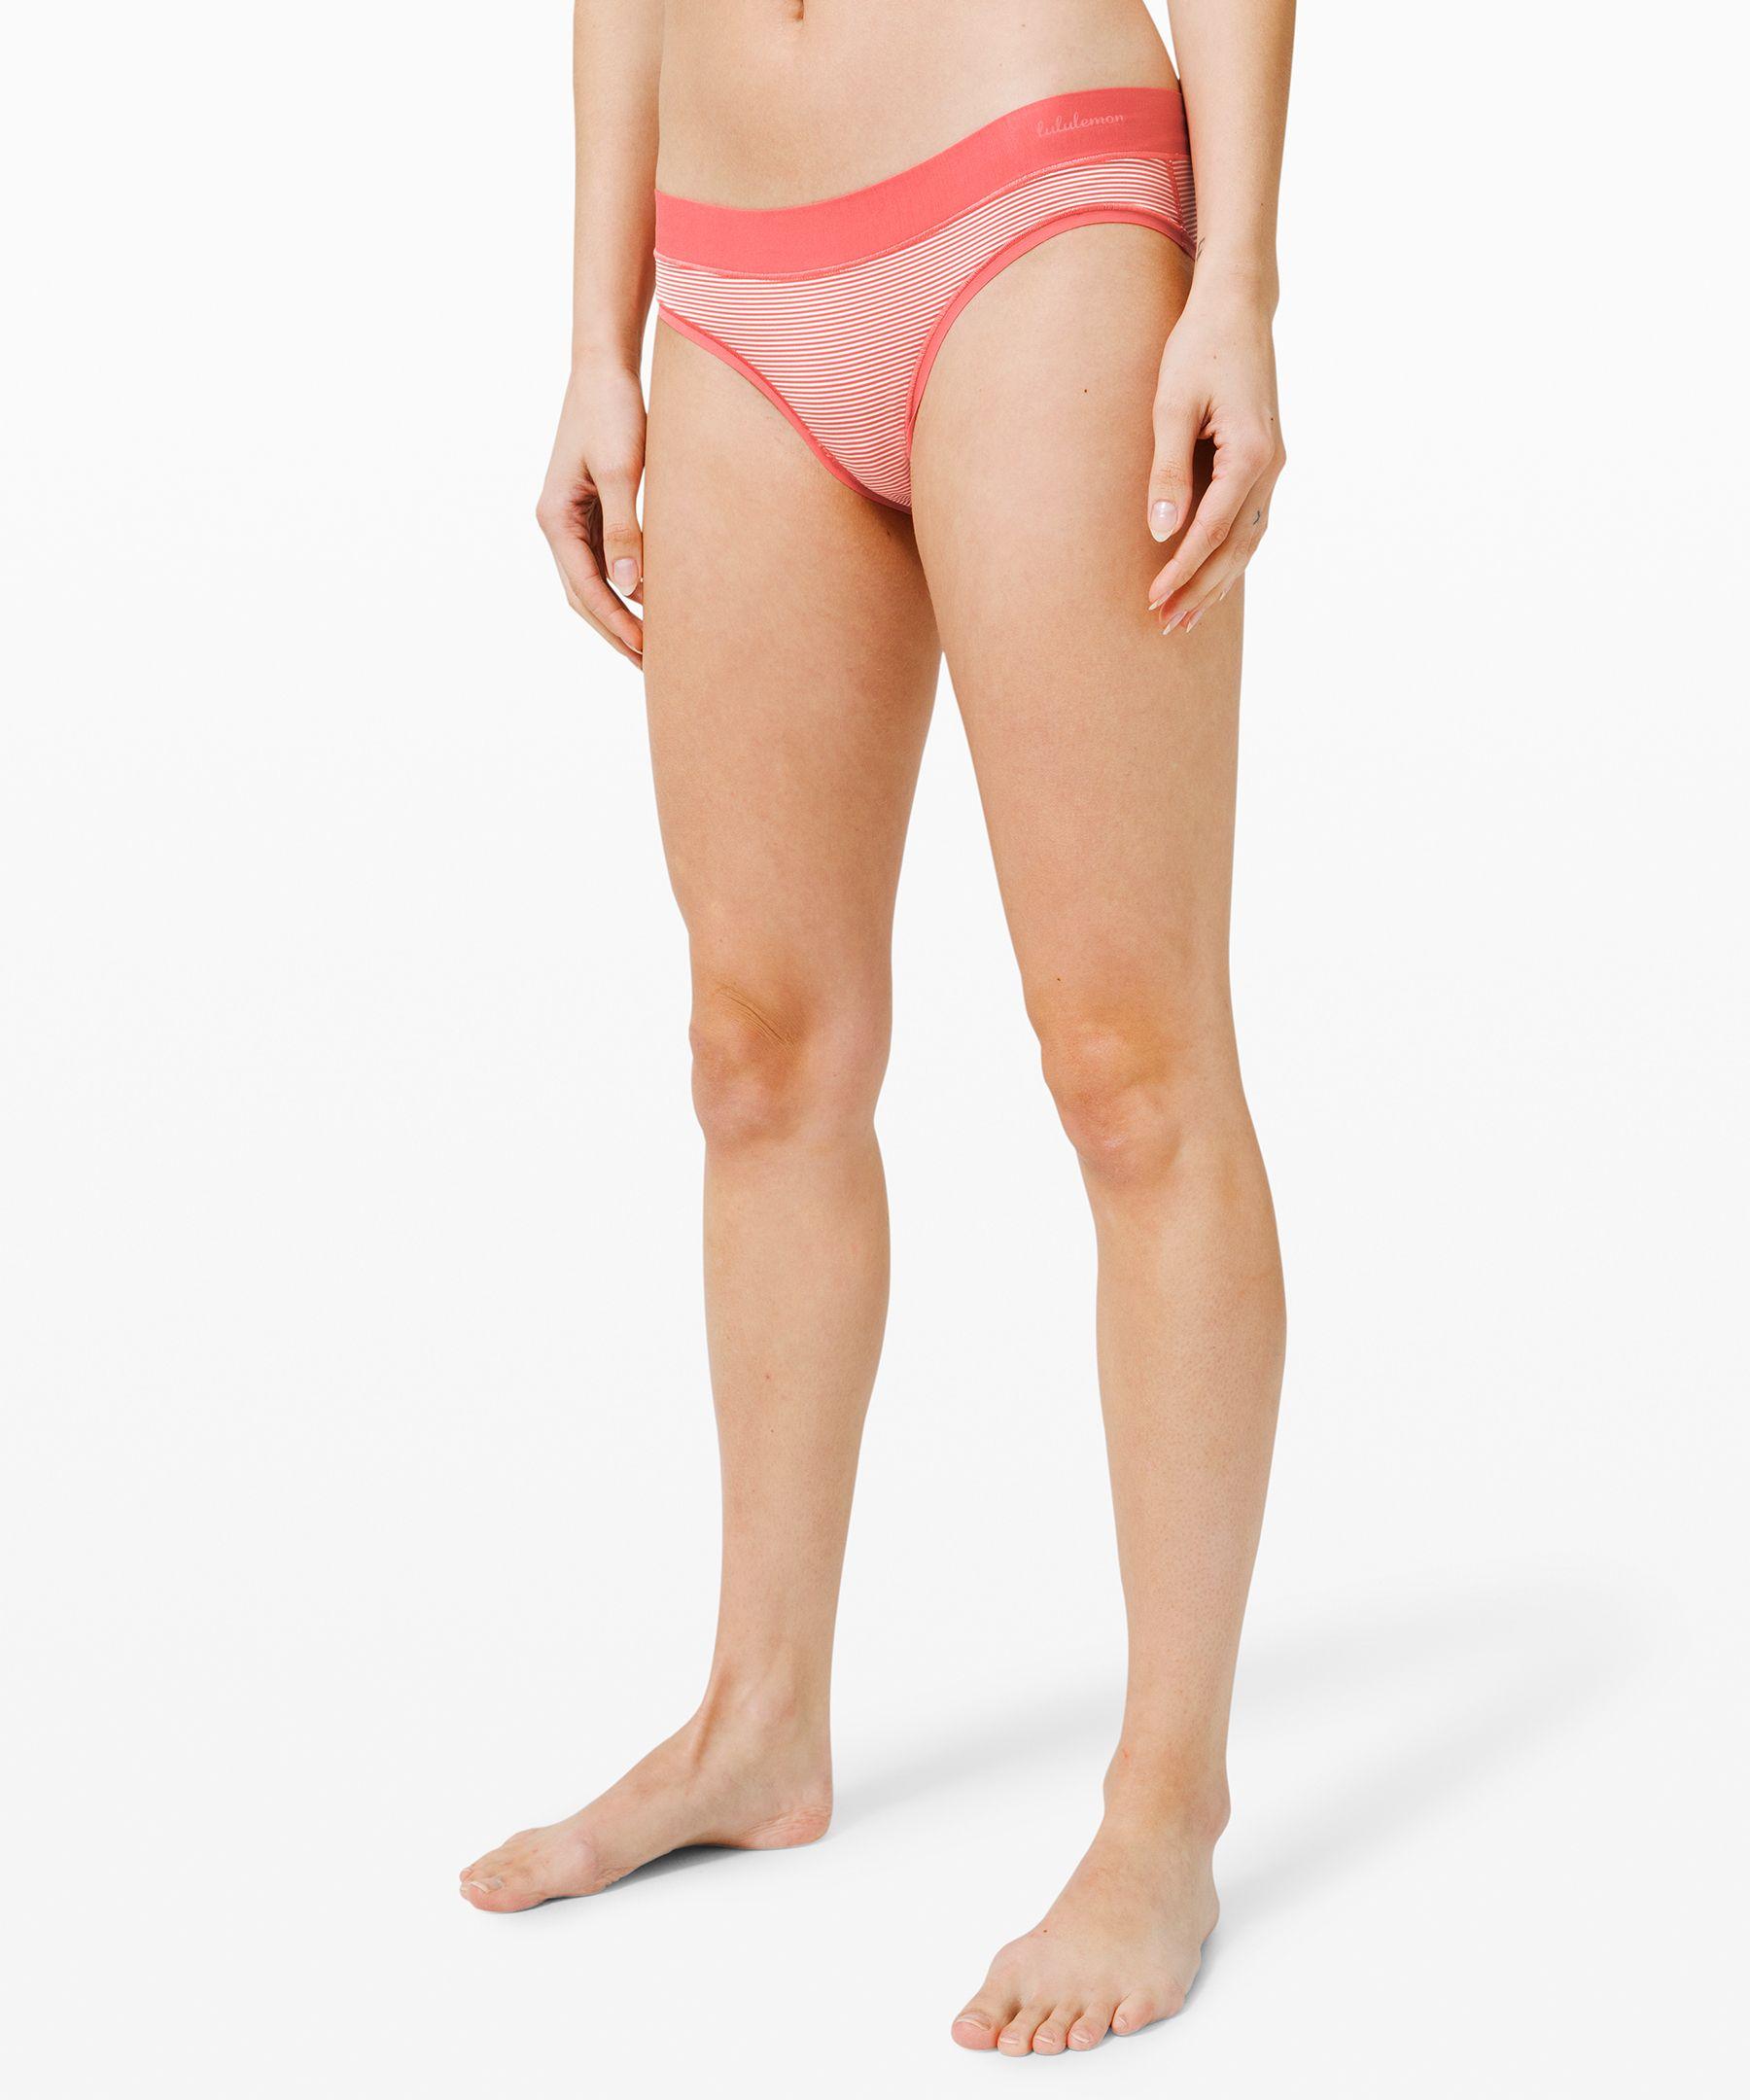 Soft Breathable Bikini